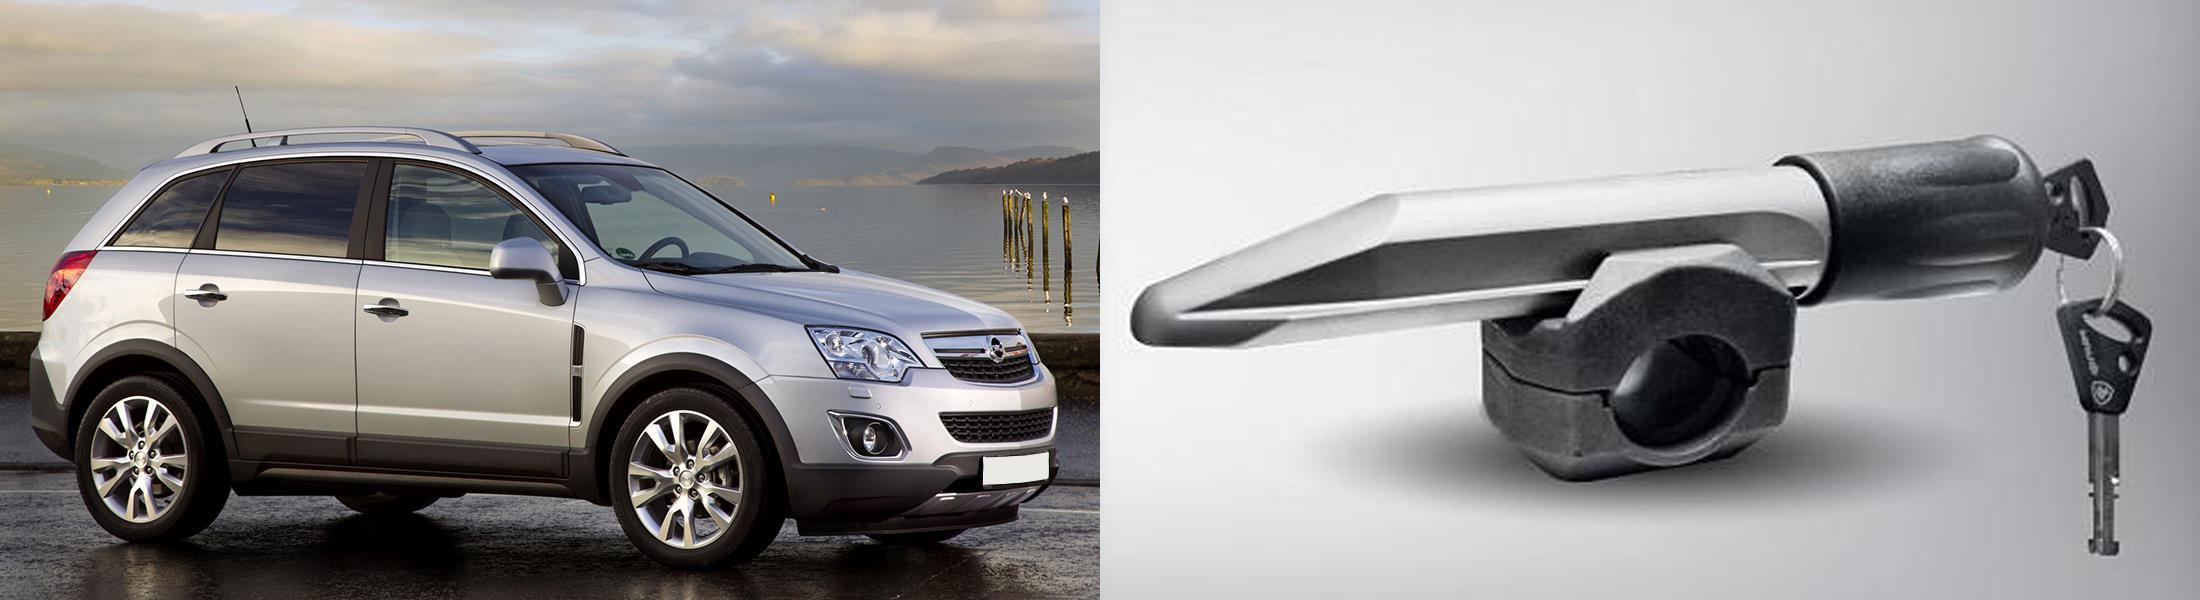 Opel Antara /2012-2015/ Гур, Гарант Блок Люкс 284.E/К041.E/f